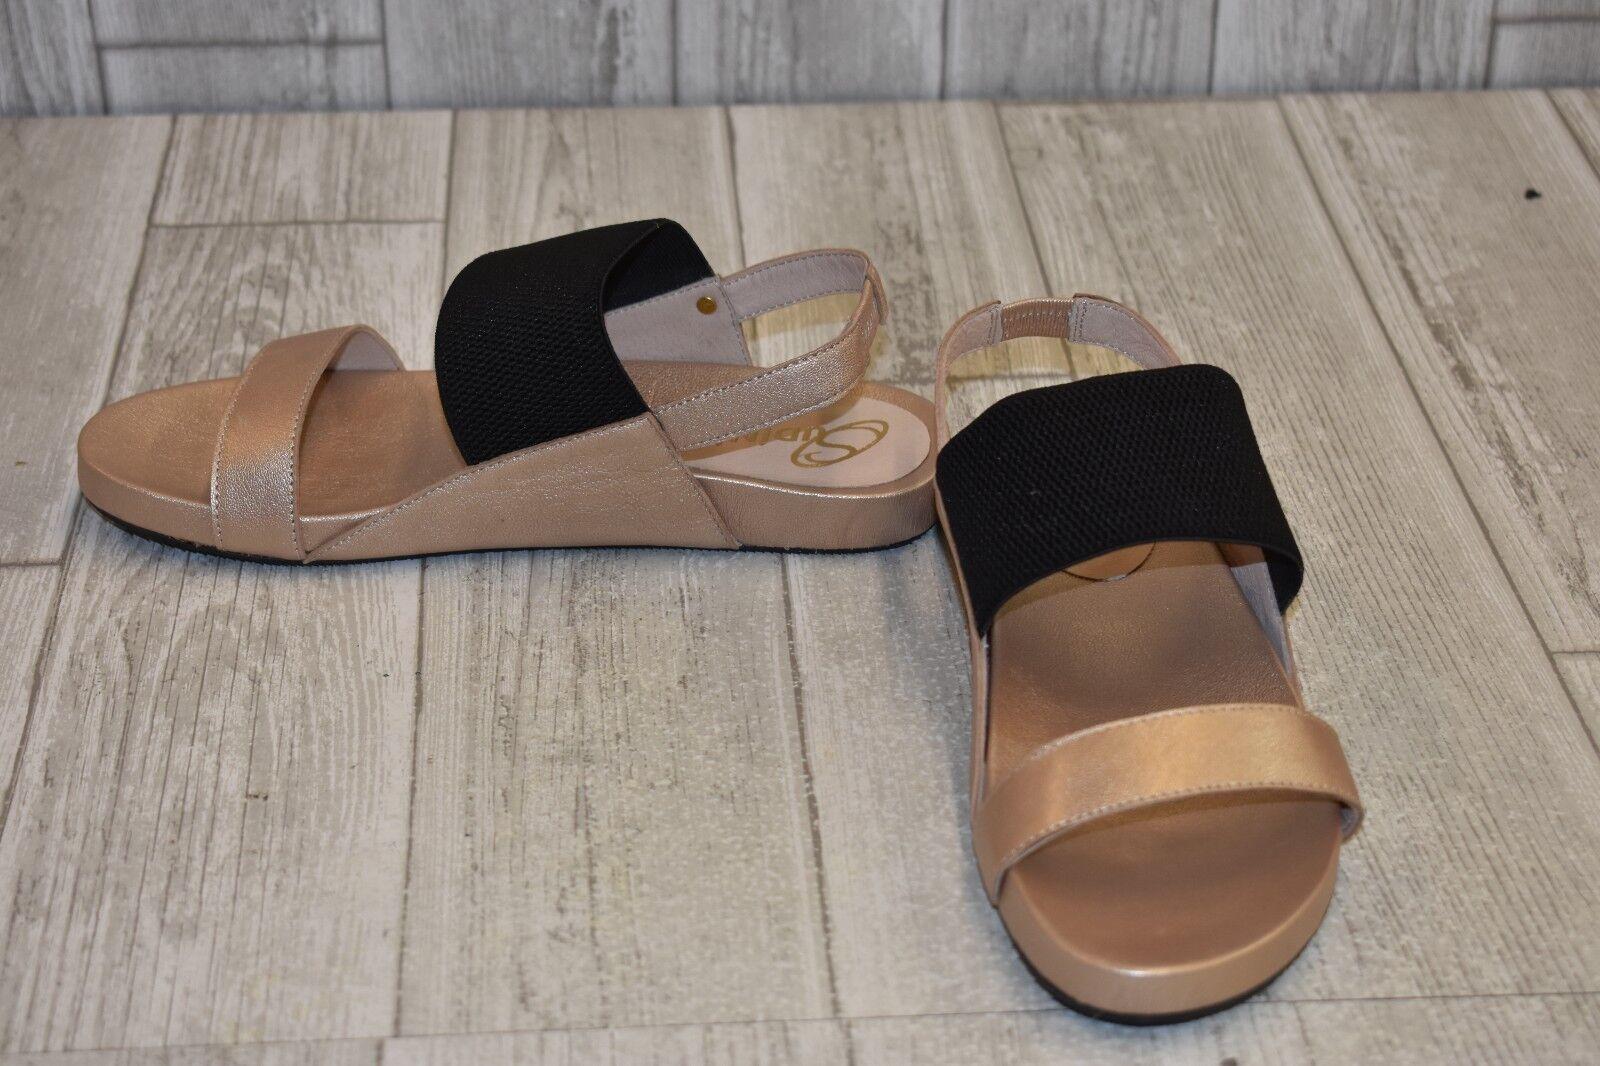 Sudini Hailey Sandal - Women's Size 7.5 M, Sand Sand Sand Metallic 219b76